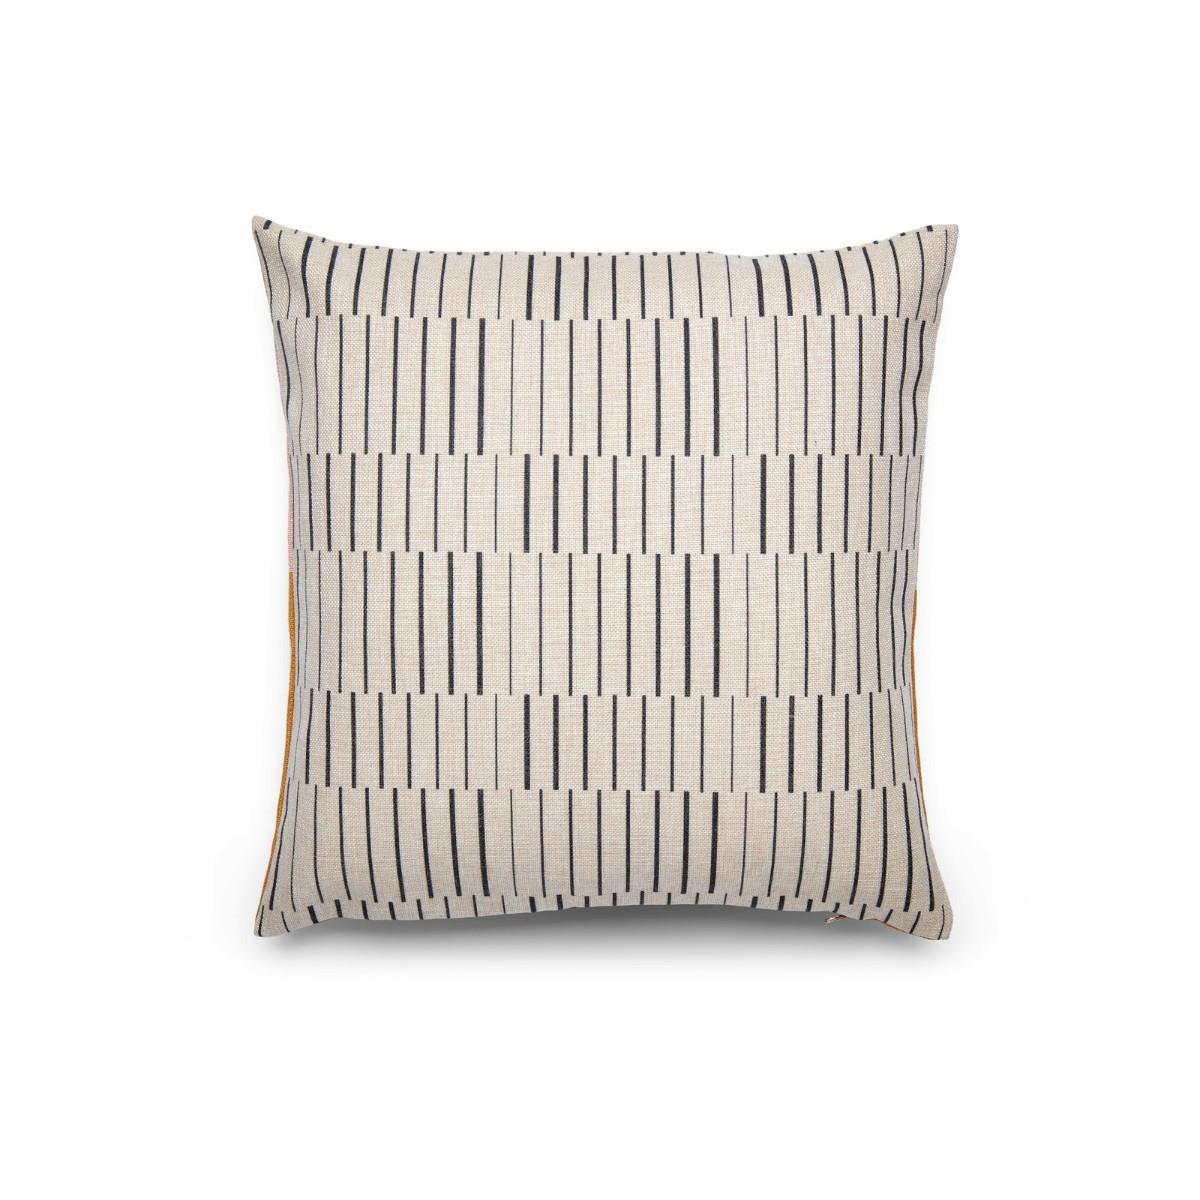 Fest I Blush Cushions (M. ENGELGEER) 45x45cm